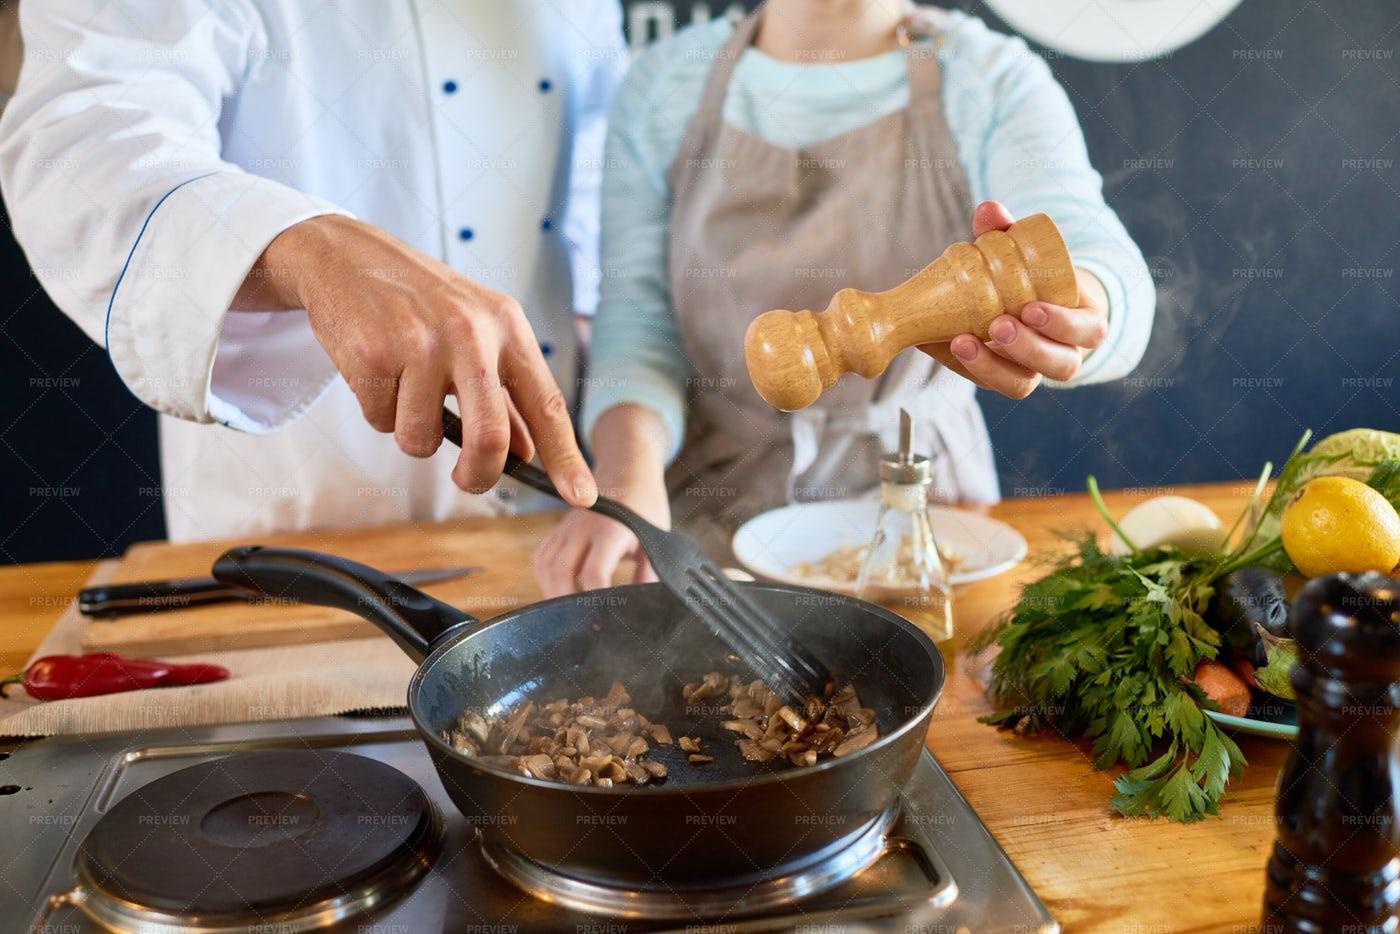 Open Kitchen In Restaurant: Stock Photos